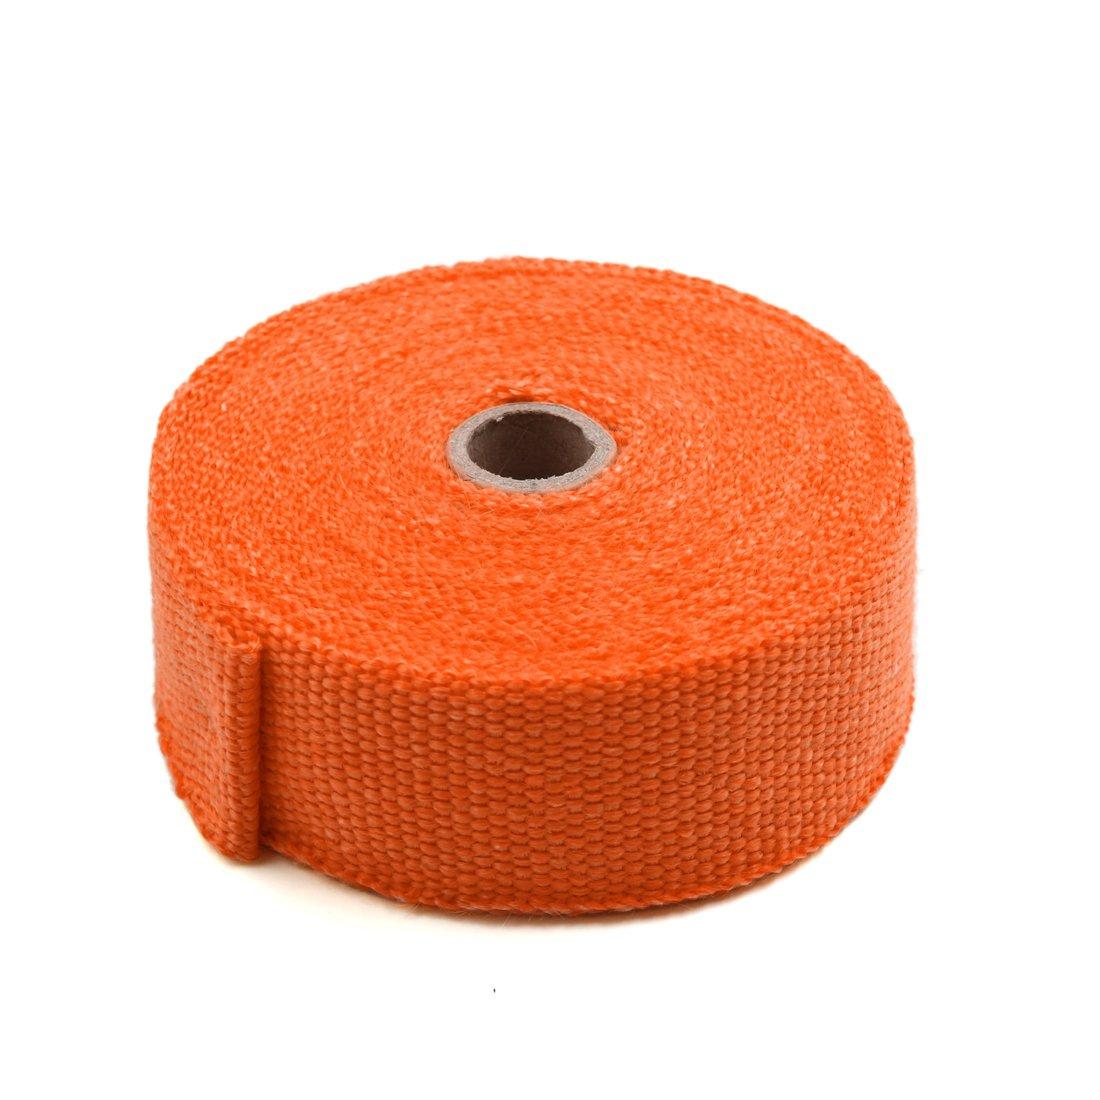 Sourcingmap Orange 10M Length Fiberglass Cloth Car Exhaust Pipe Heat Insulation Wrap Tape